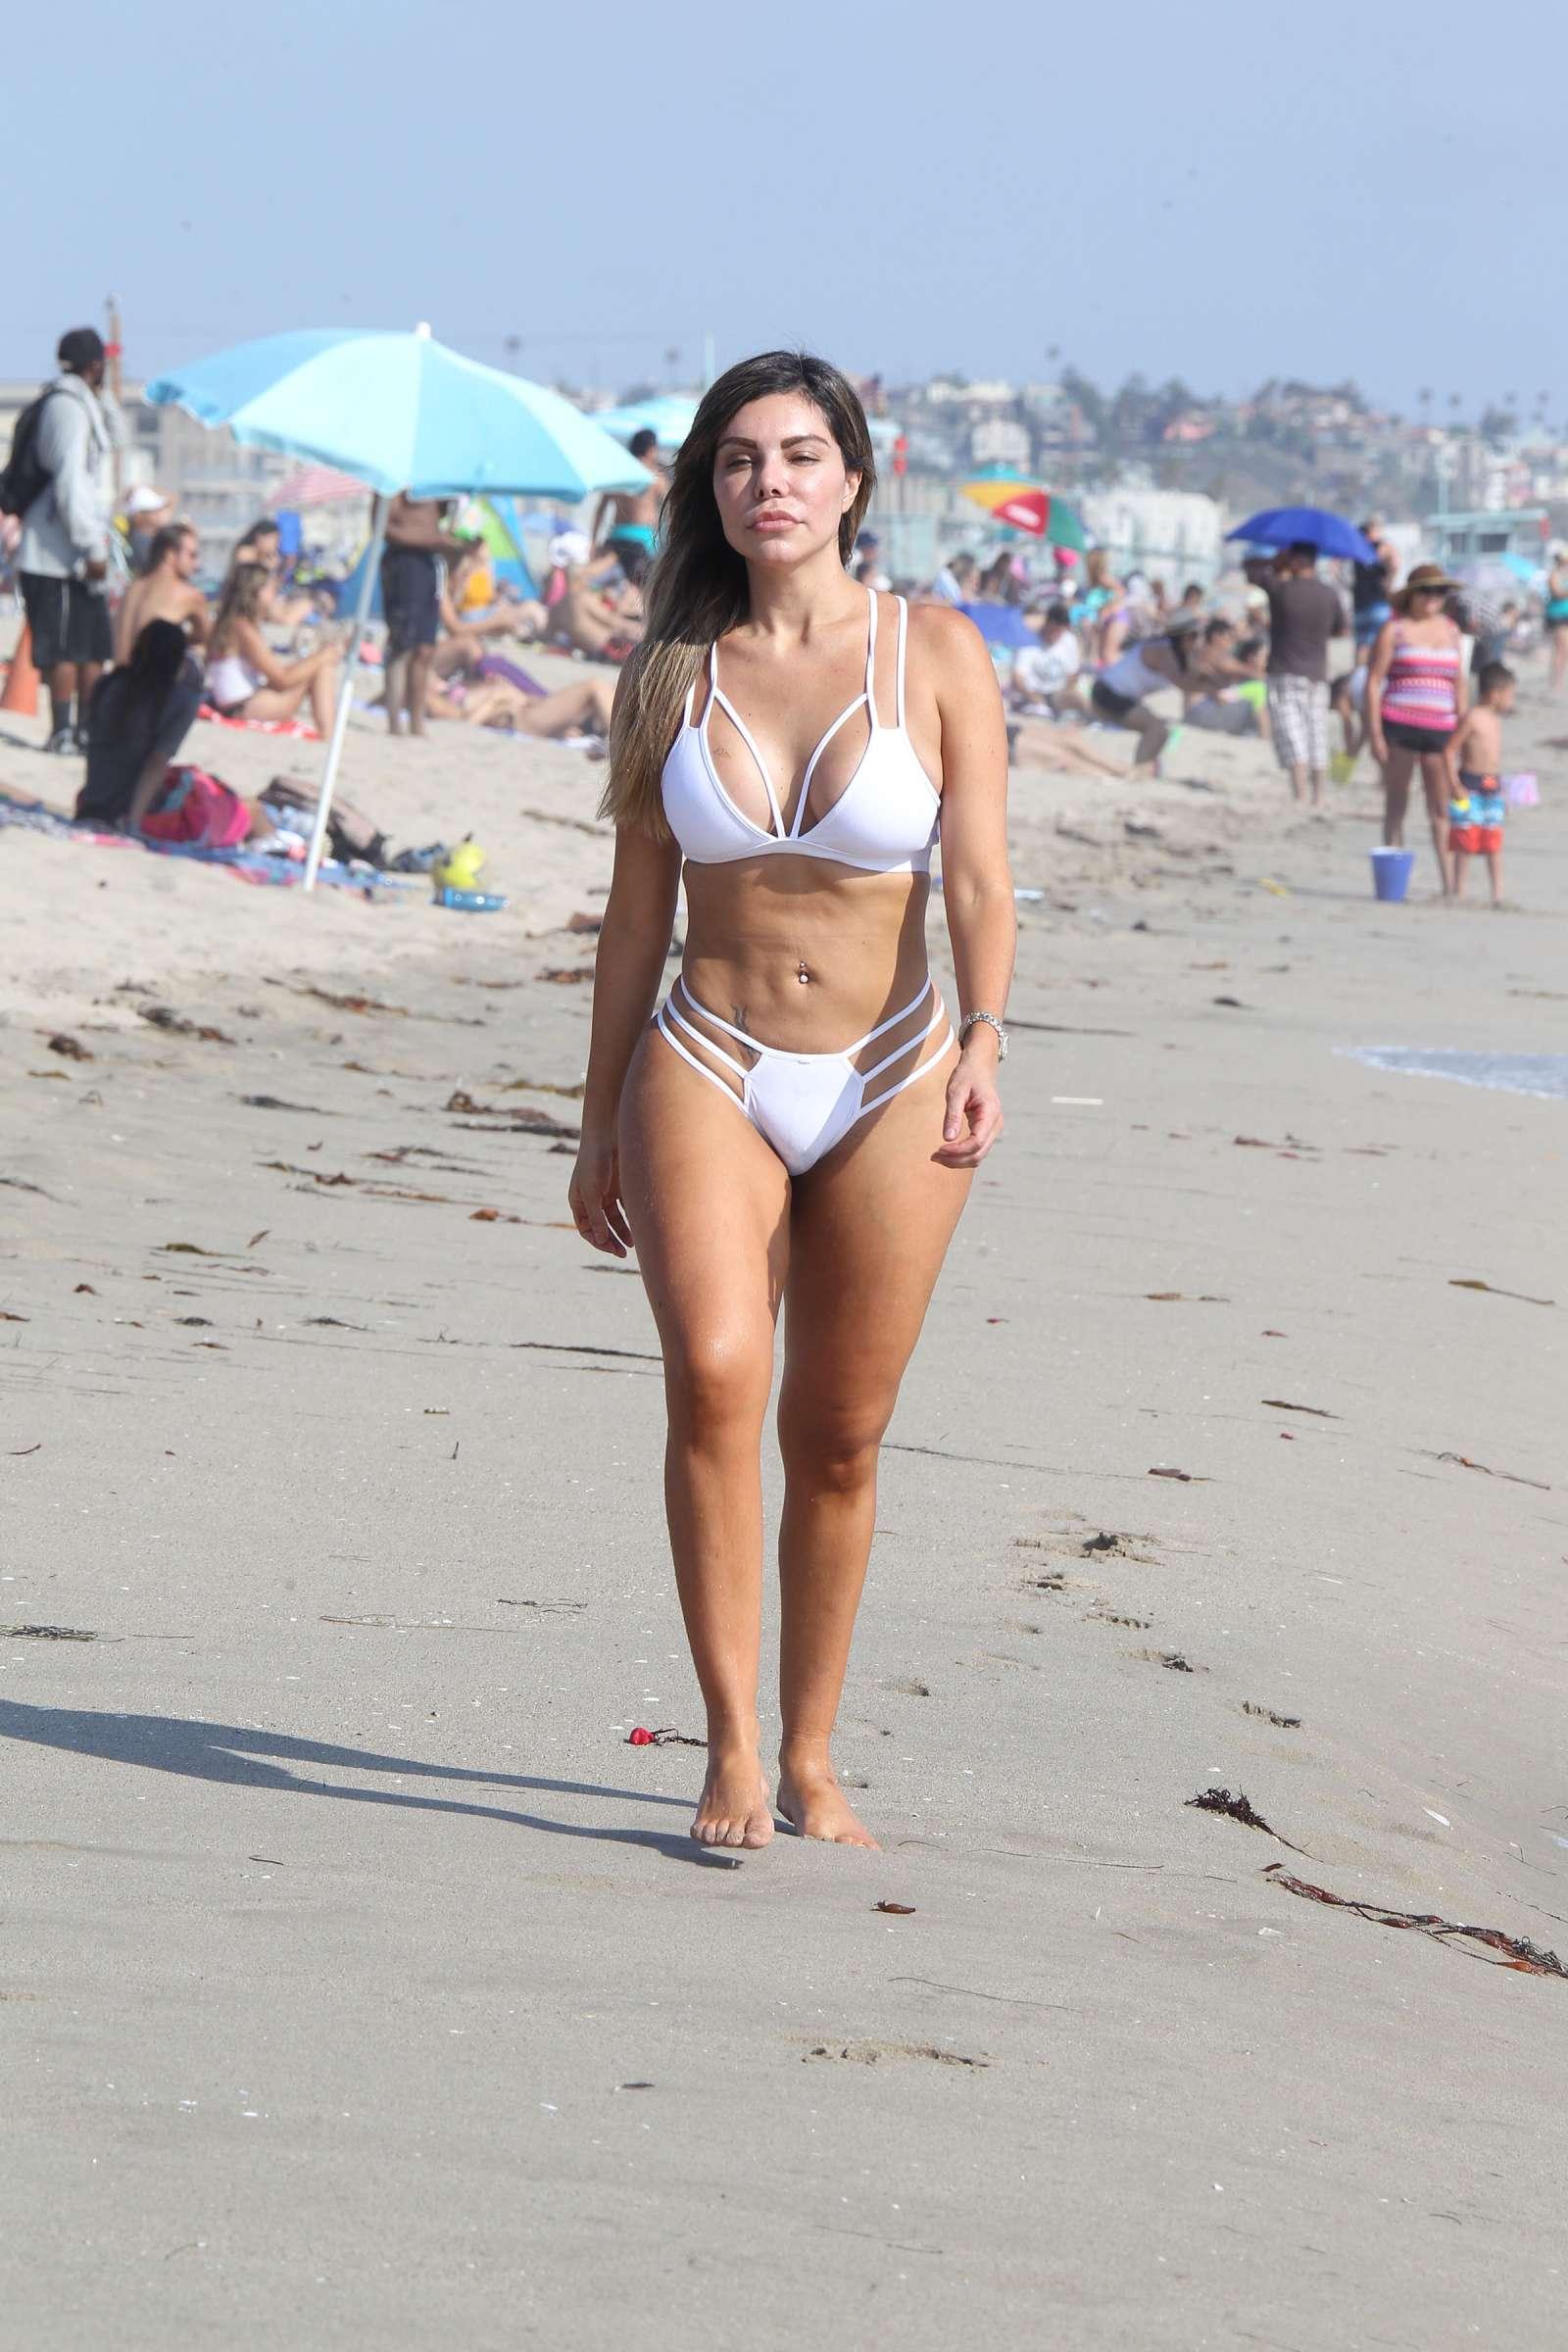 Paparazzi Liziane Gutierrez nudes (79 photos), Tits, Paparazzi, Selfie, underwear 2018